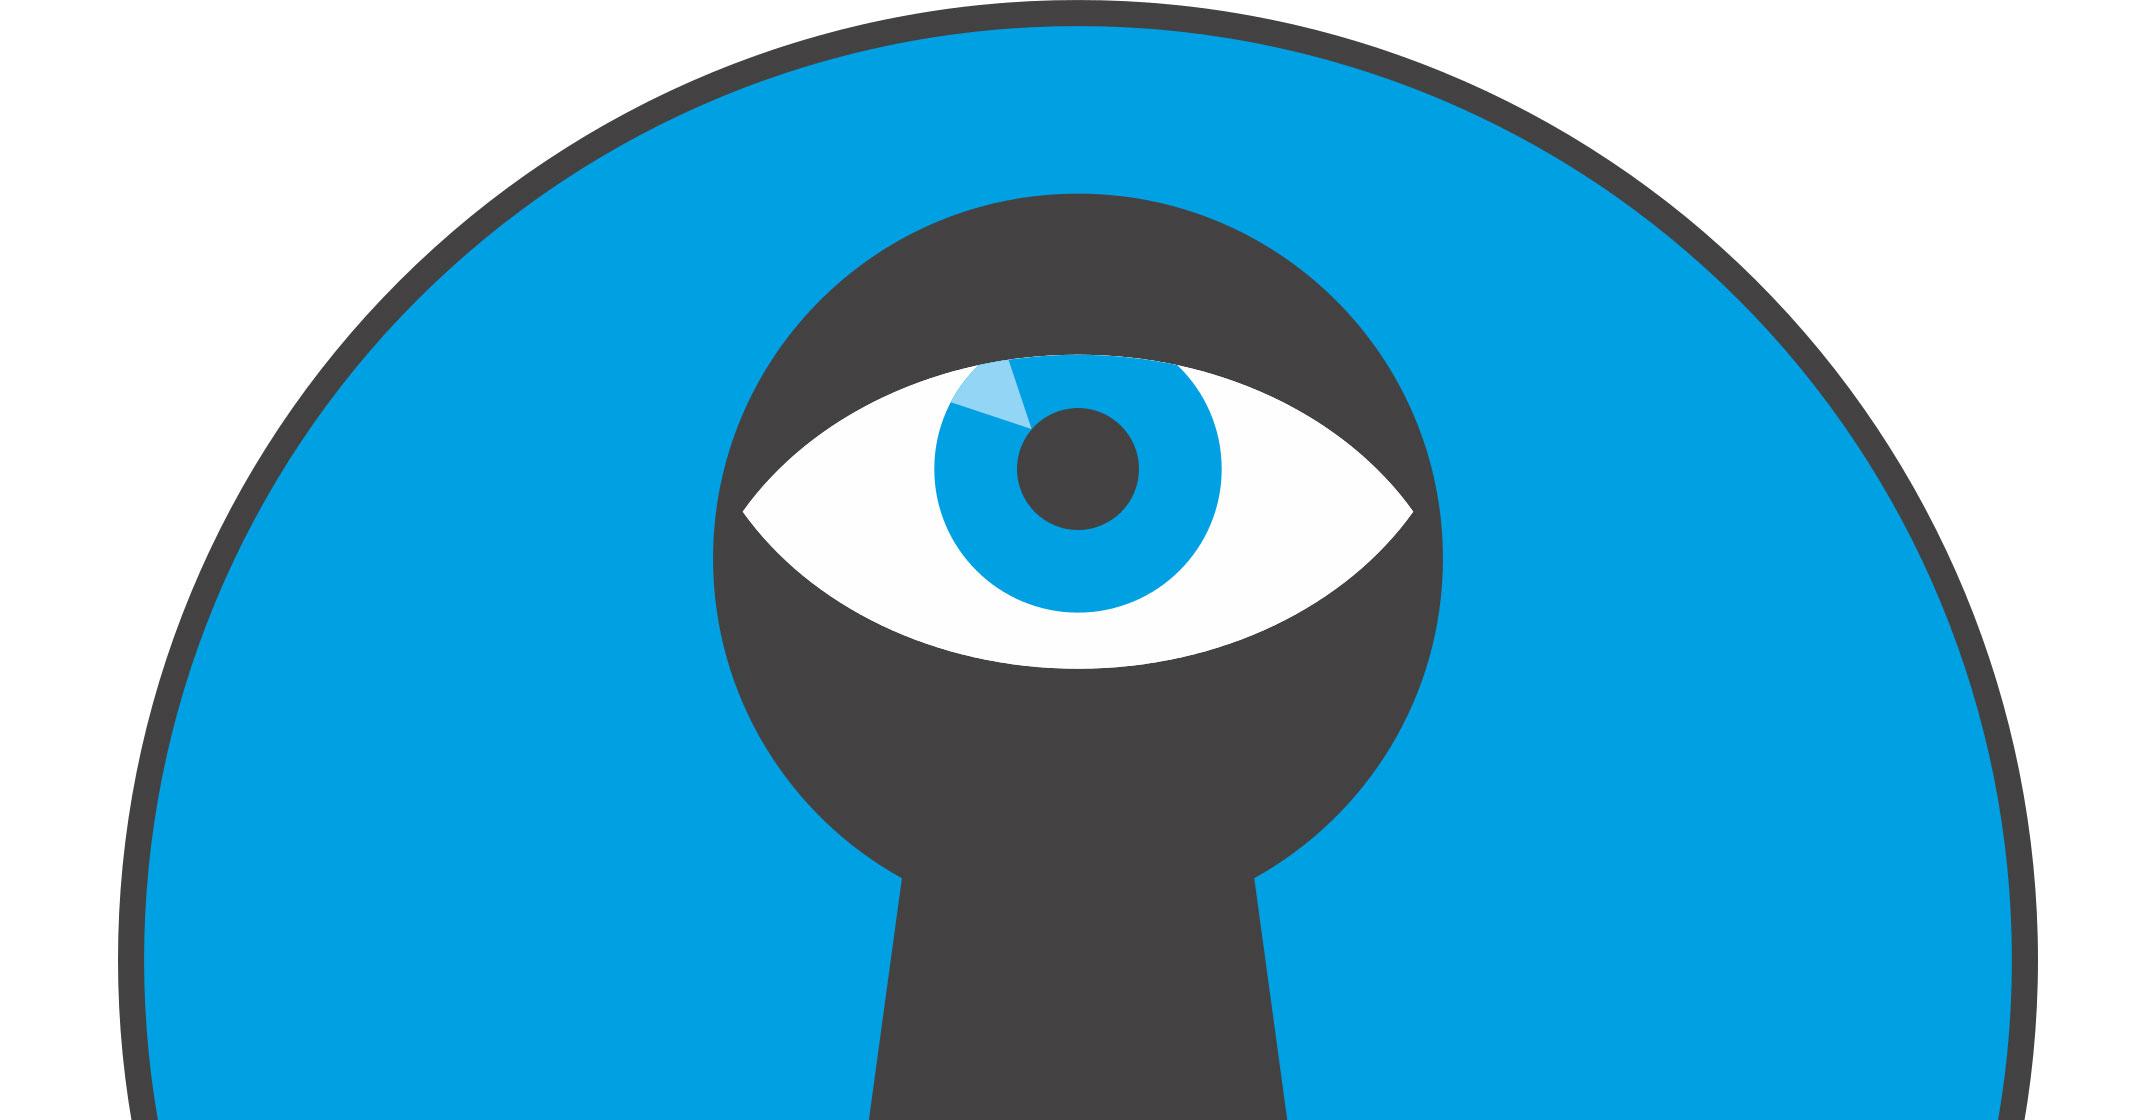 Constitutional court bans bulk Internet surveillance in South Africa